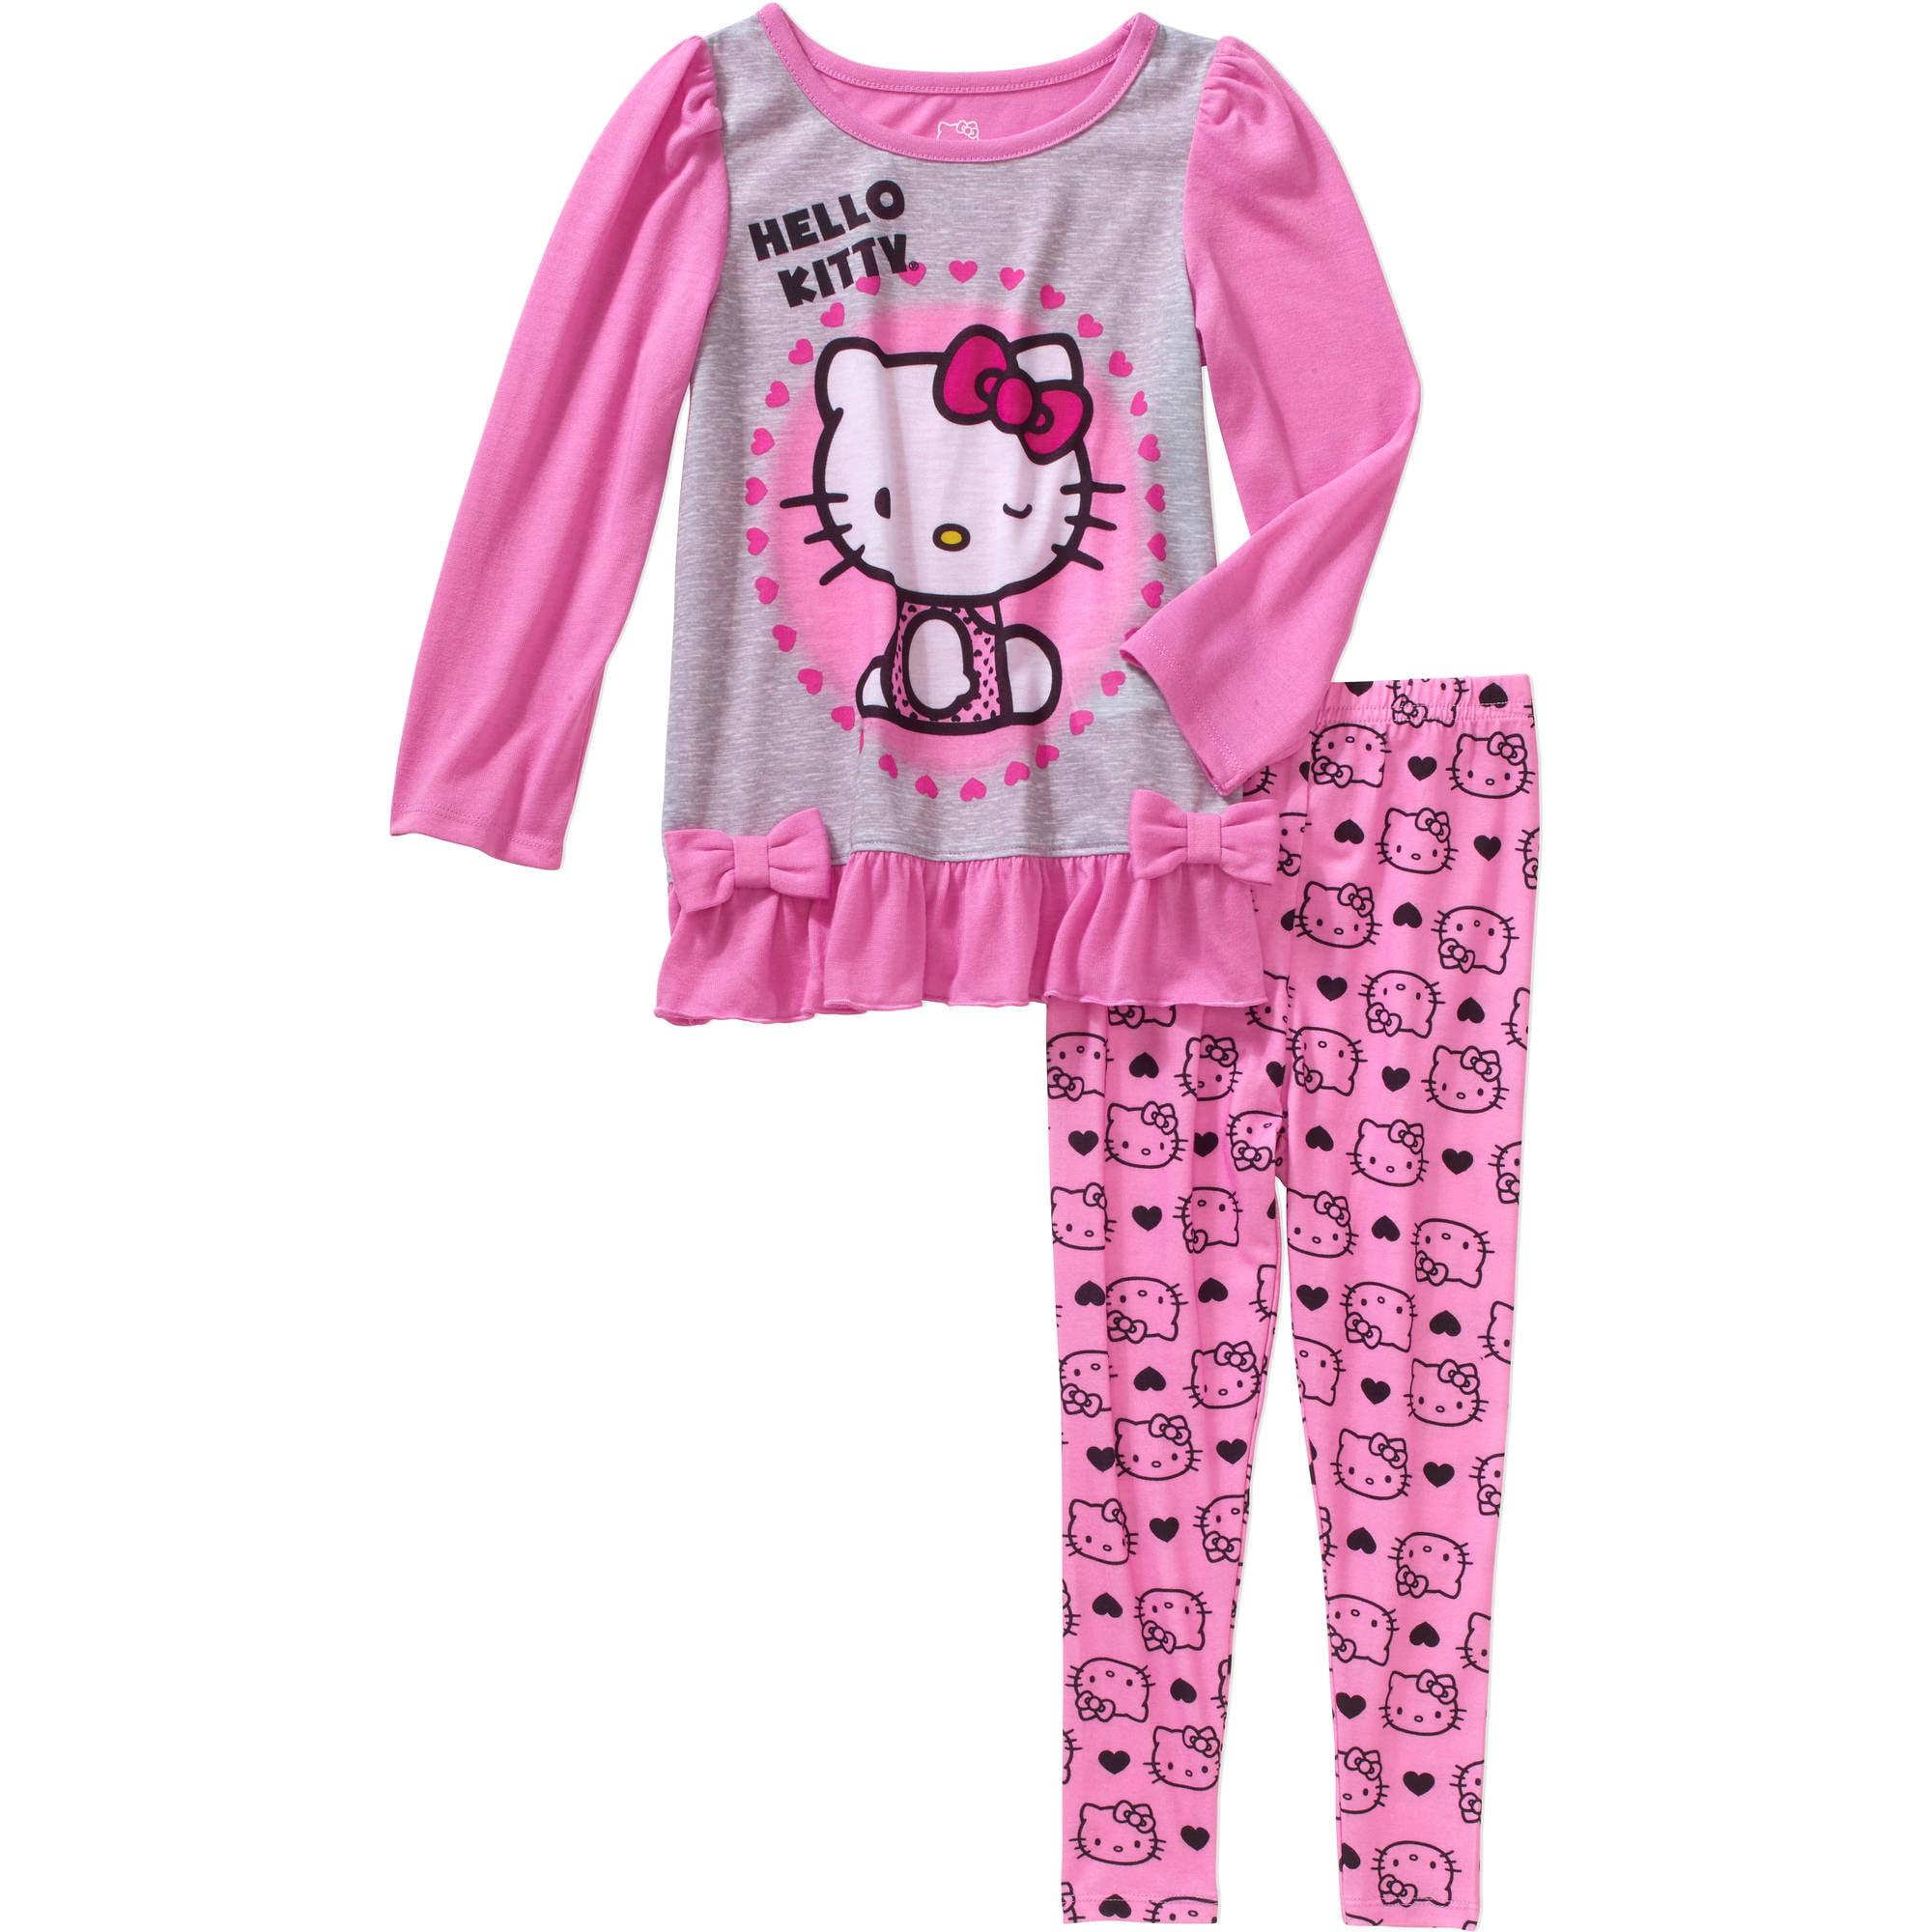 Hello Kitty Toddler Girls' Pajamas with Leggings 2-Piece Set